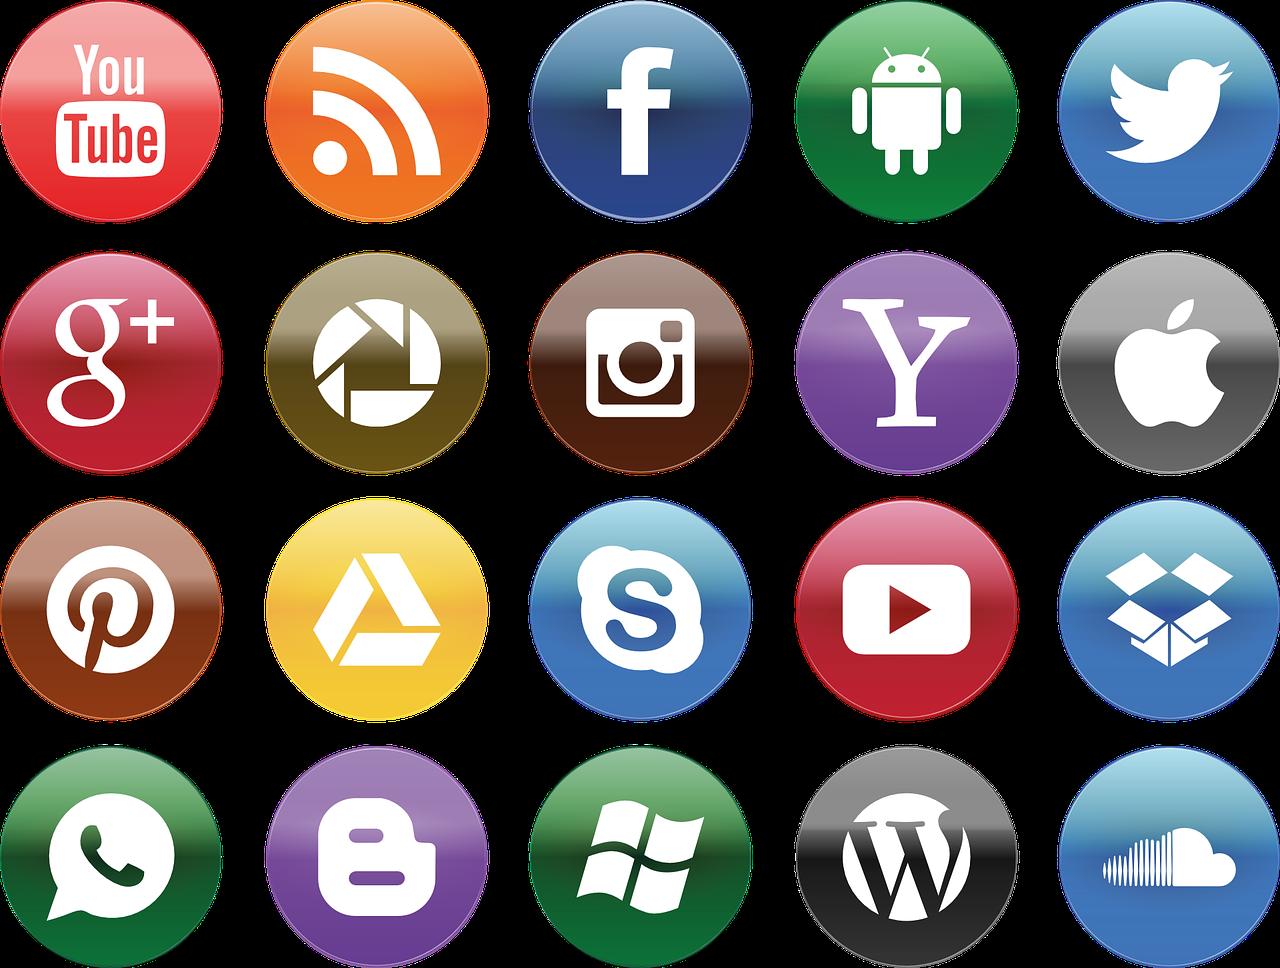 Création d'un site Internet Osny avec WordPress